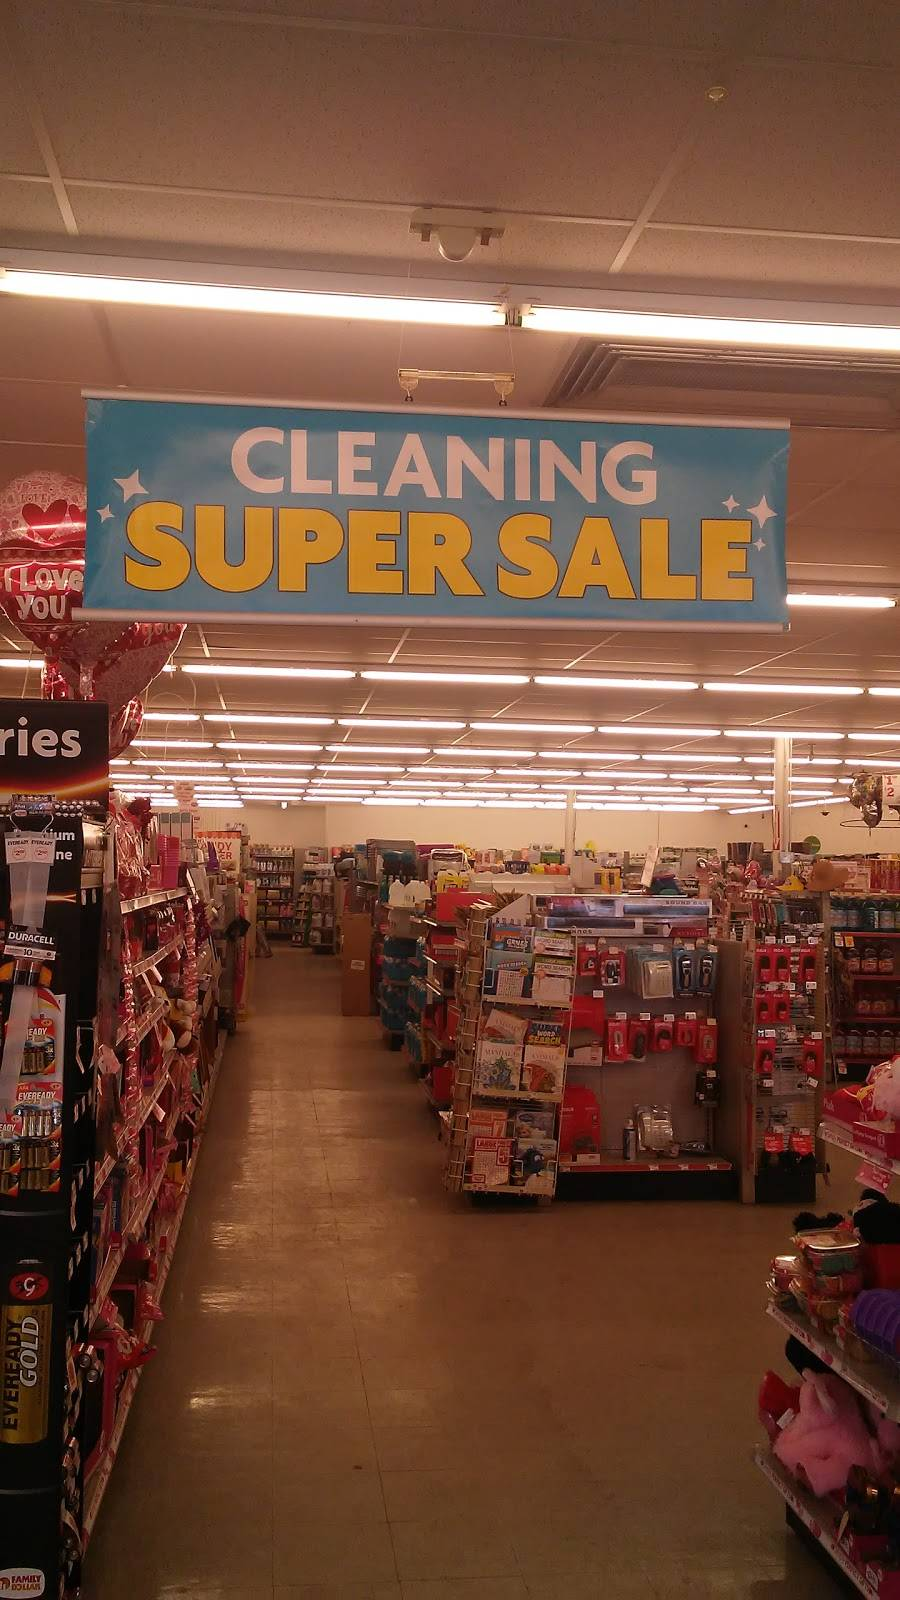 Family Dollar - supermarket  | Photo 1 of 7 | Address: 2105 57th Ave N, Brooklyn Center, MN 55430, USA | Phone: (763) 560-9697